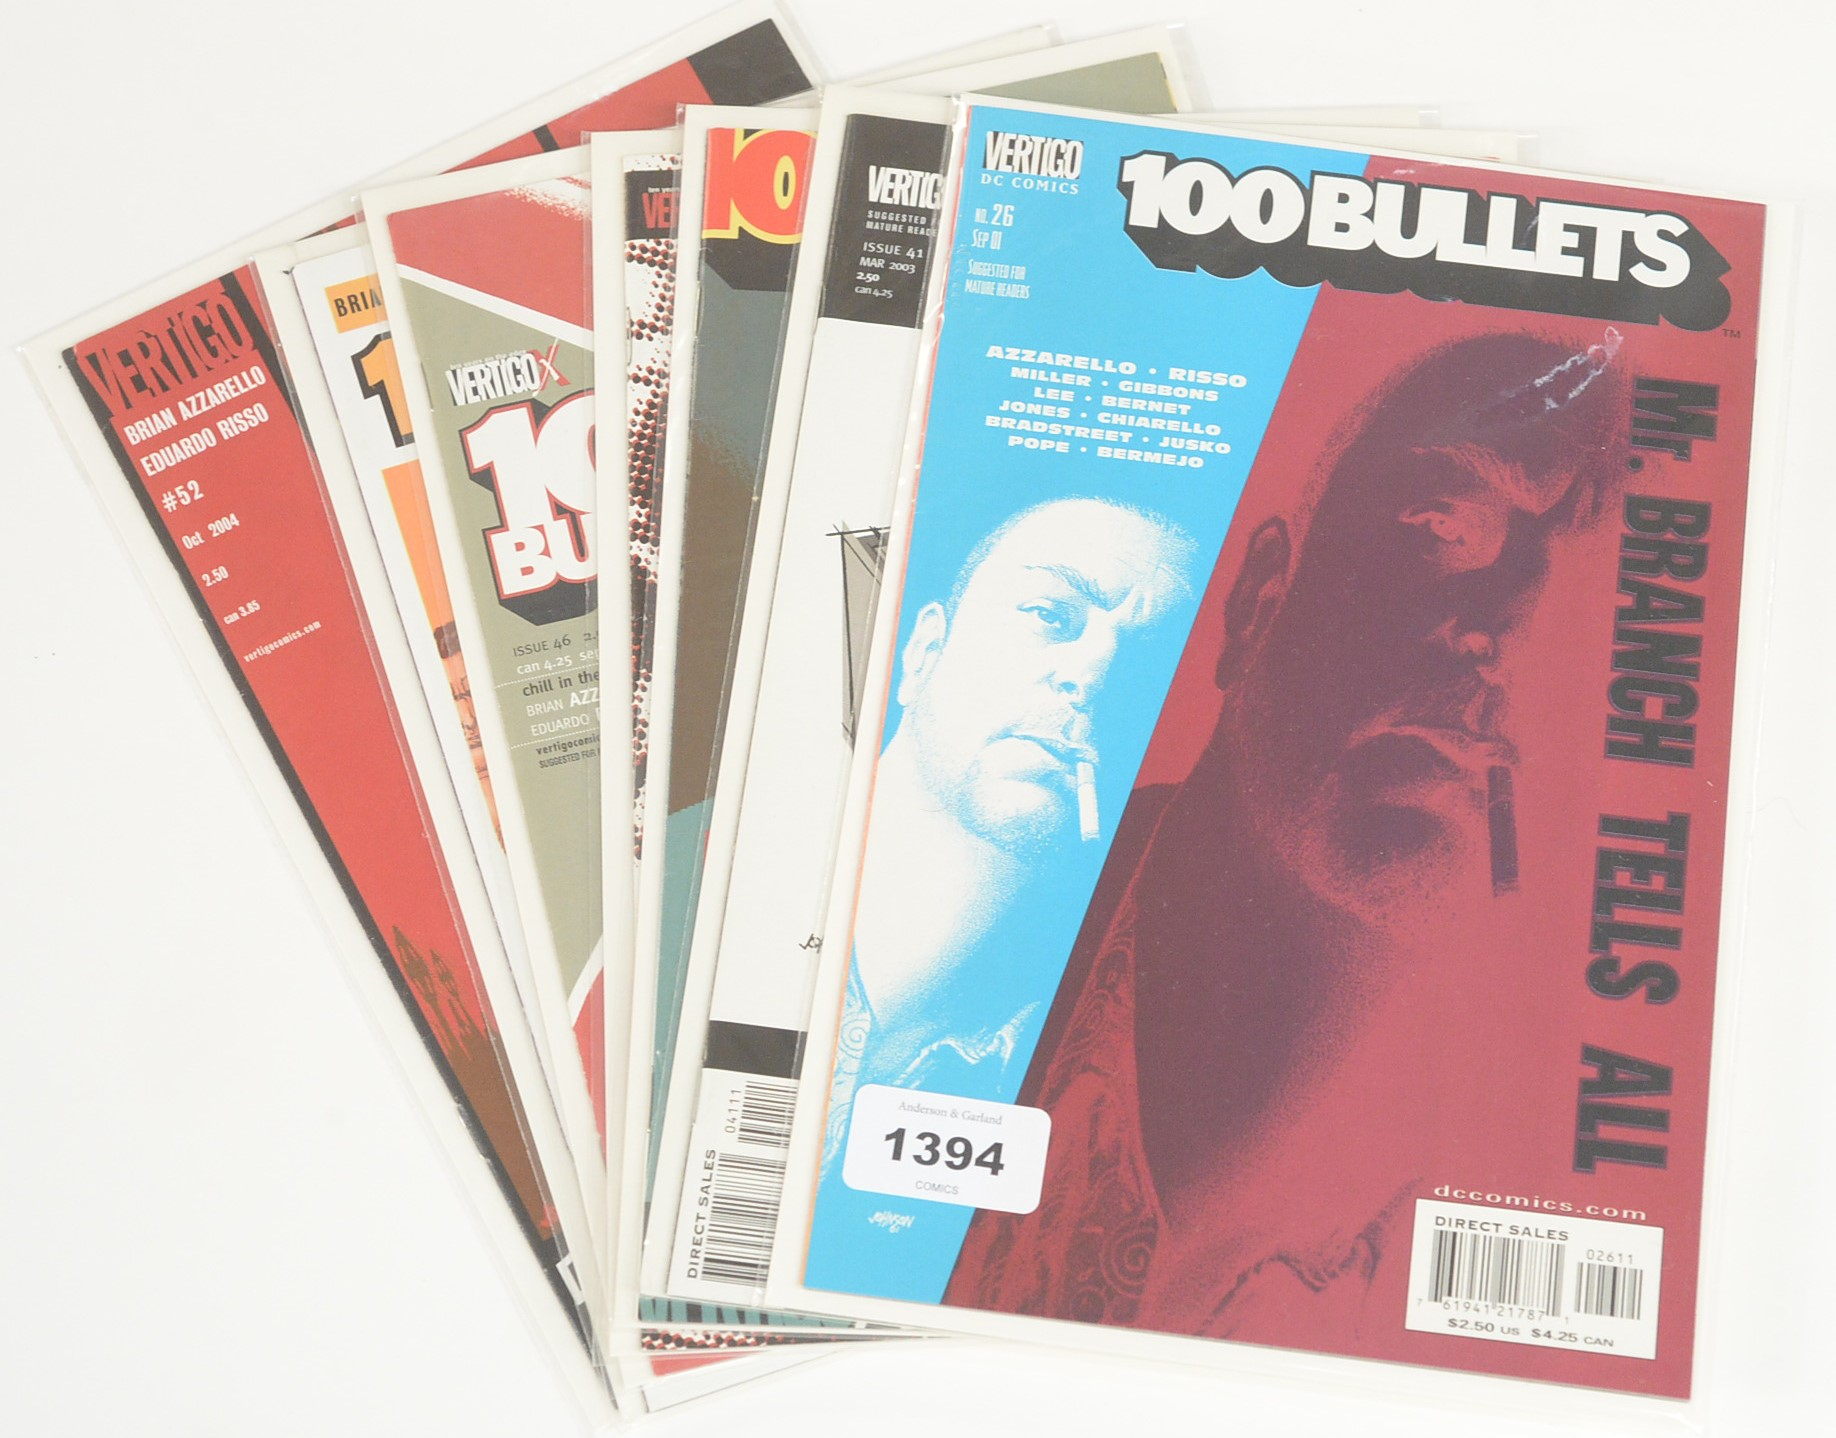 The Preacher by DC Vertigo; and 100 Bullets, sundry issues - Image 2 of 2